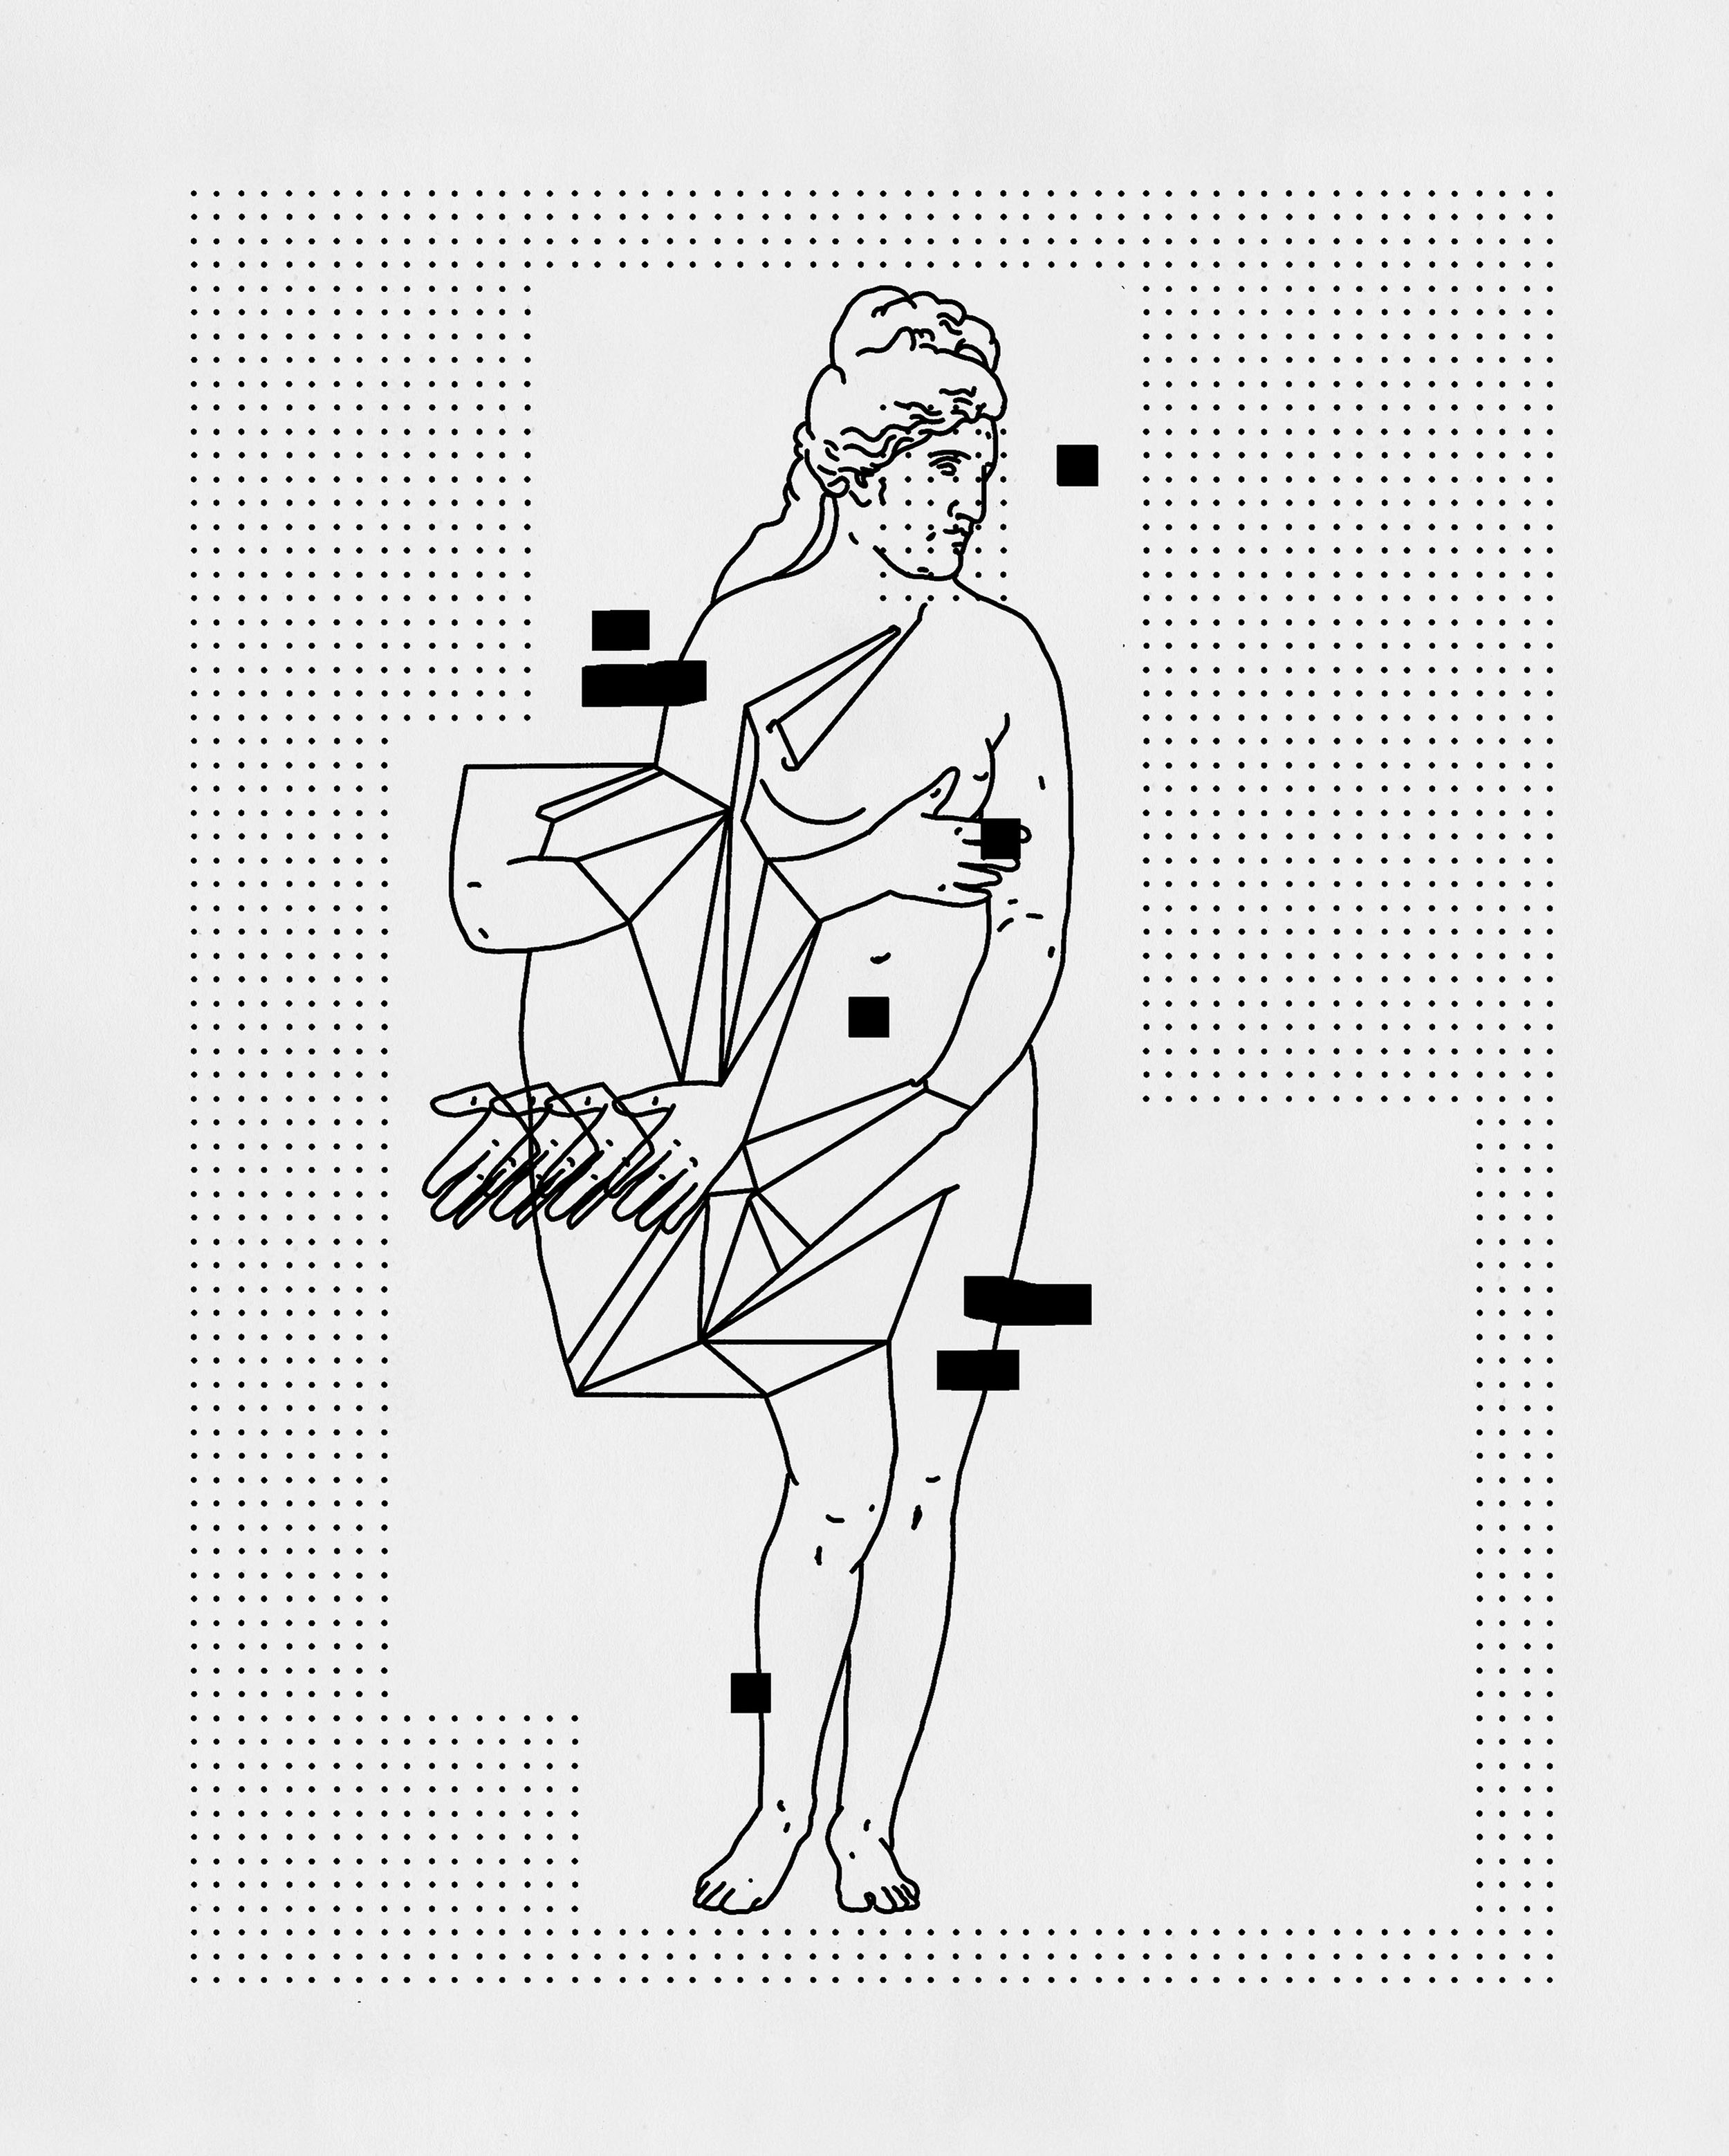 %22Cámara de Vacío%22 - 25 x 20 cm - Fine art print sobre papel - Julián Brangold - 2018.jpg